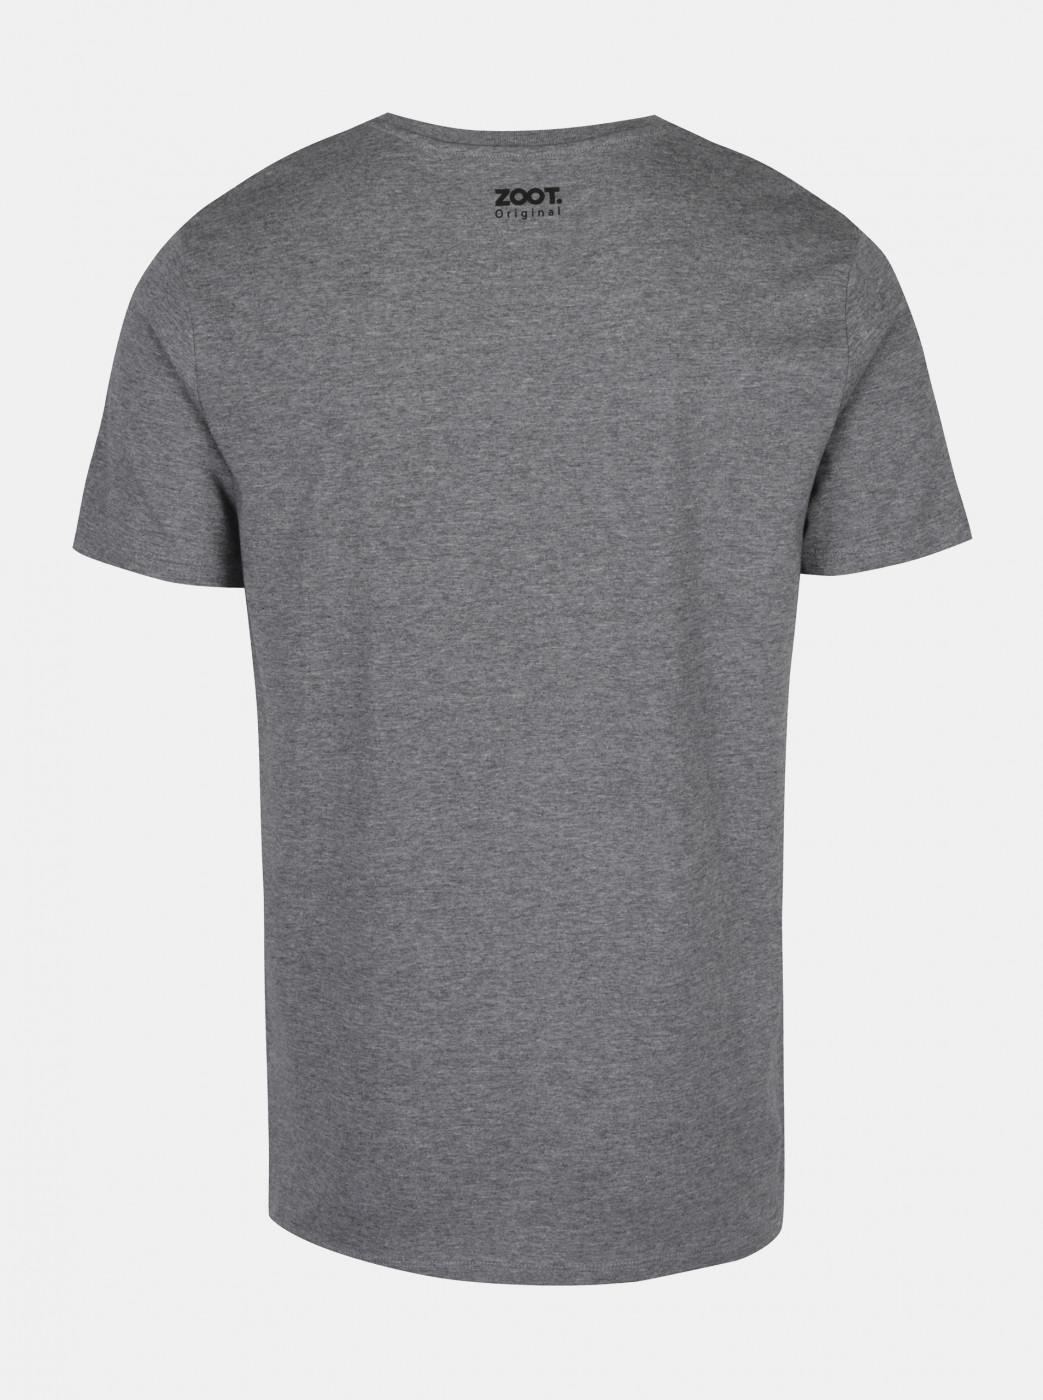 Zoot Original Grey Men's Annealed T-shirt I Love Uho